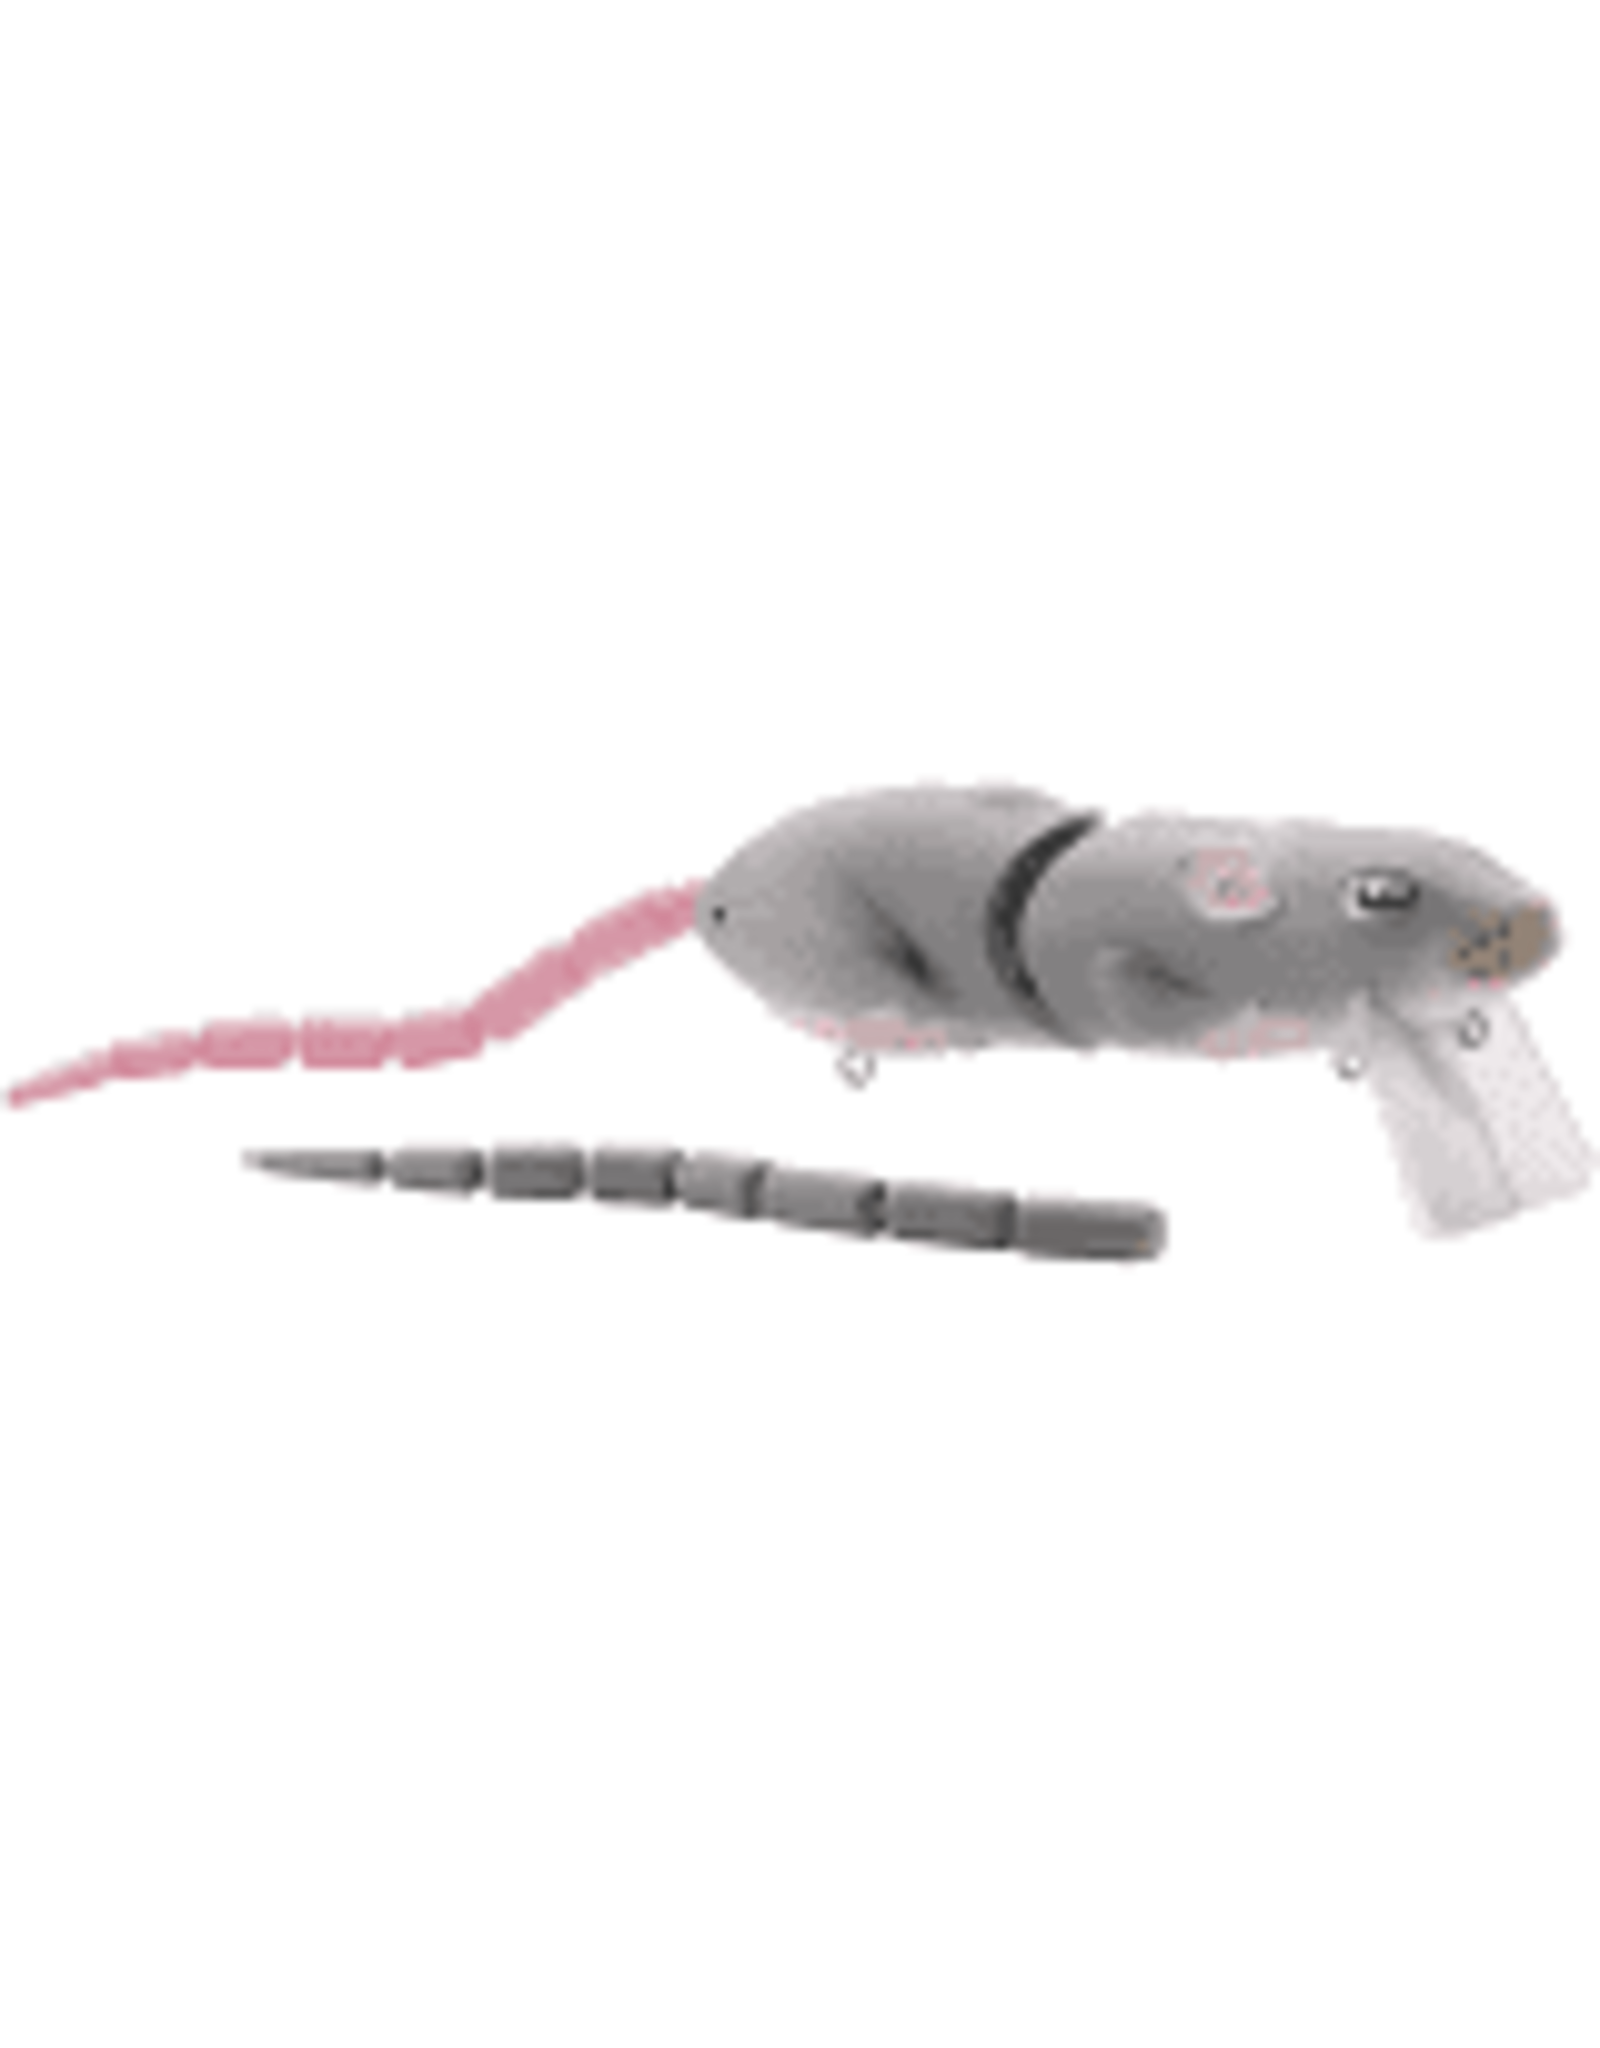 SPRO BBZ-1 Rat